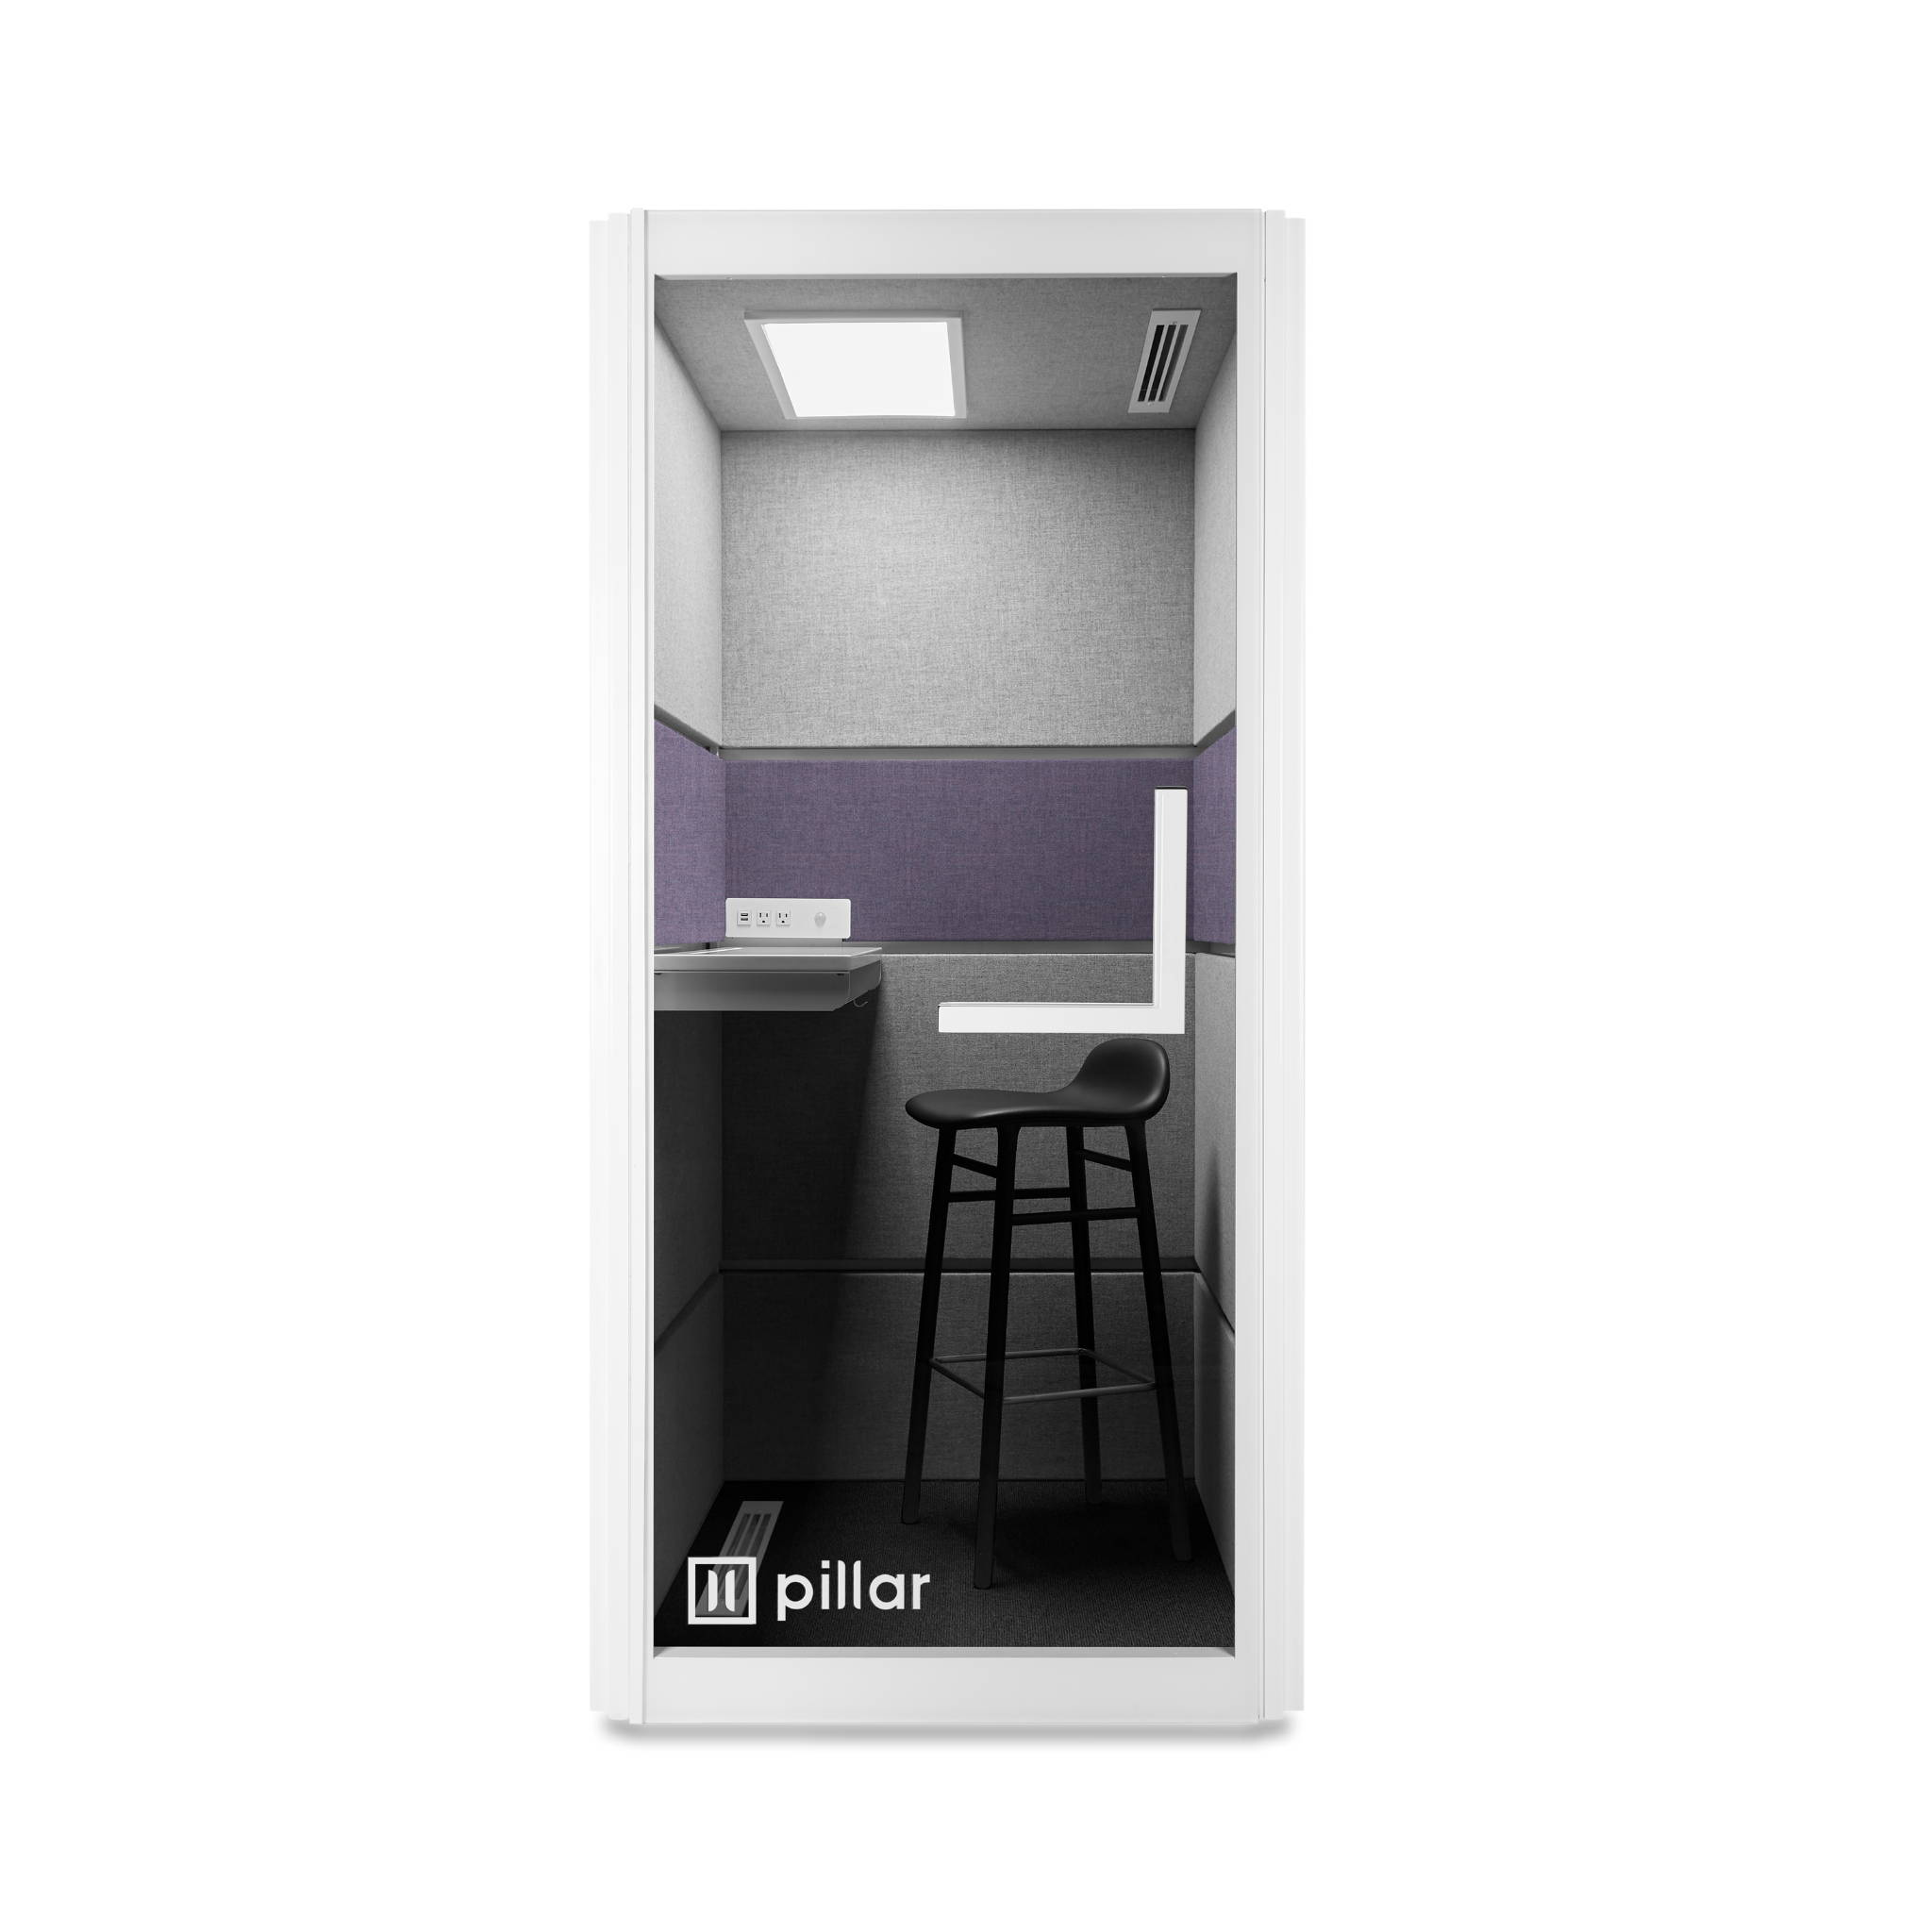 pillar booth amethyst panels